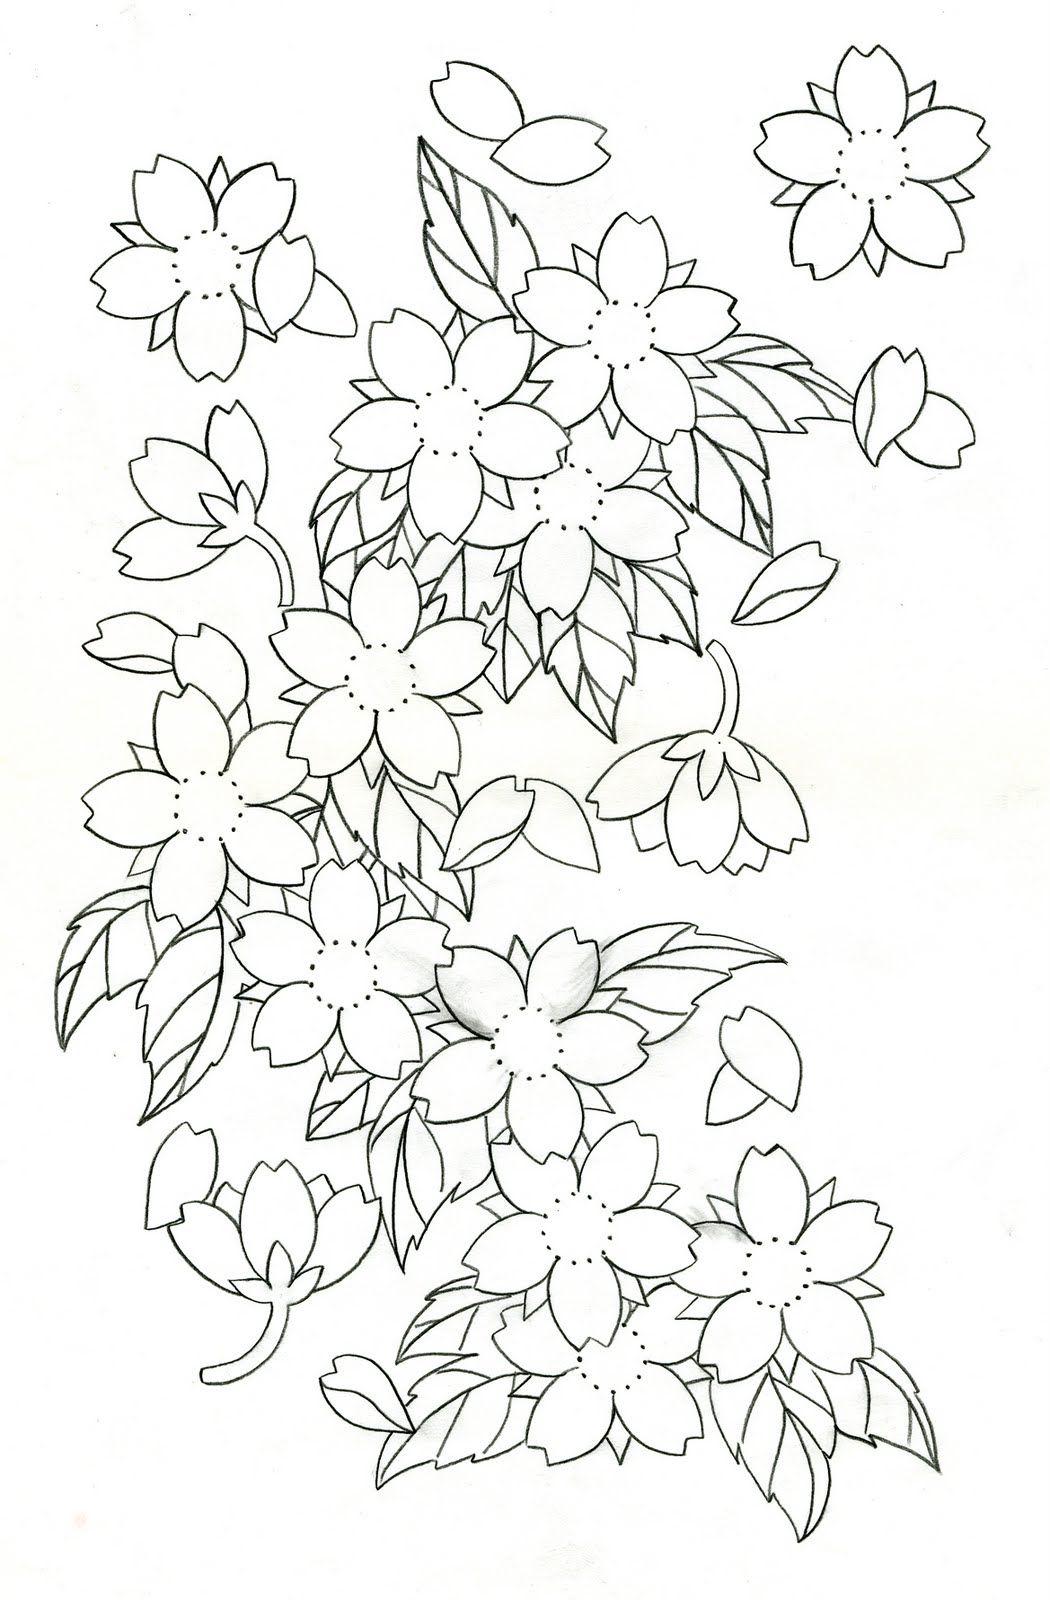 Cherry Blossom Tattoo Designs | Cherry Blossoms. | disigin ...